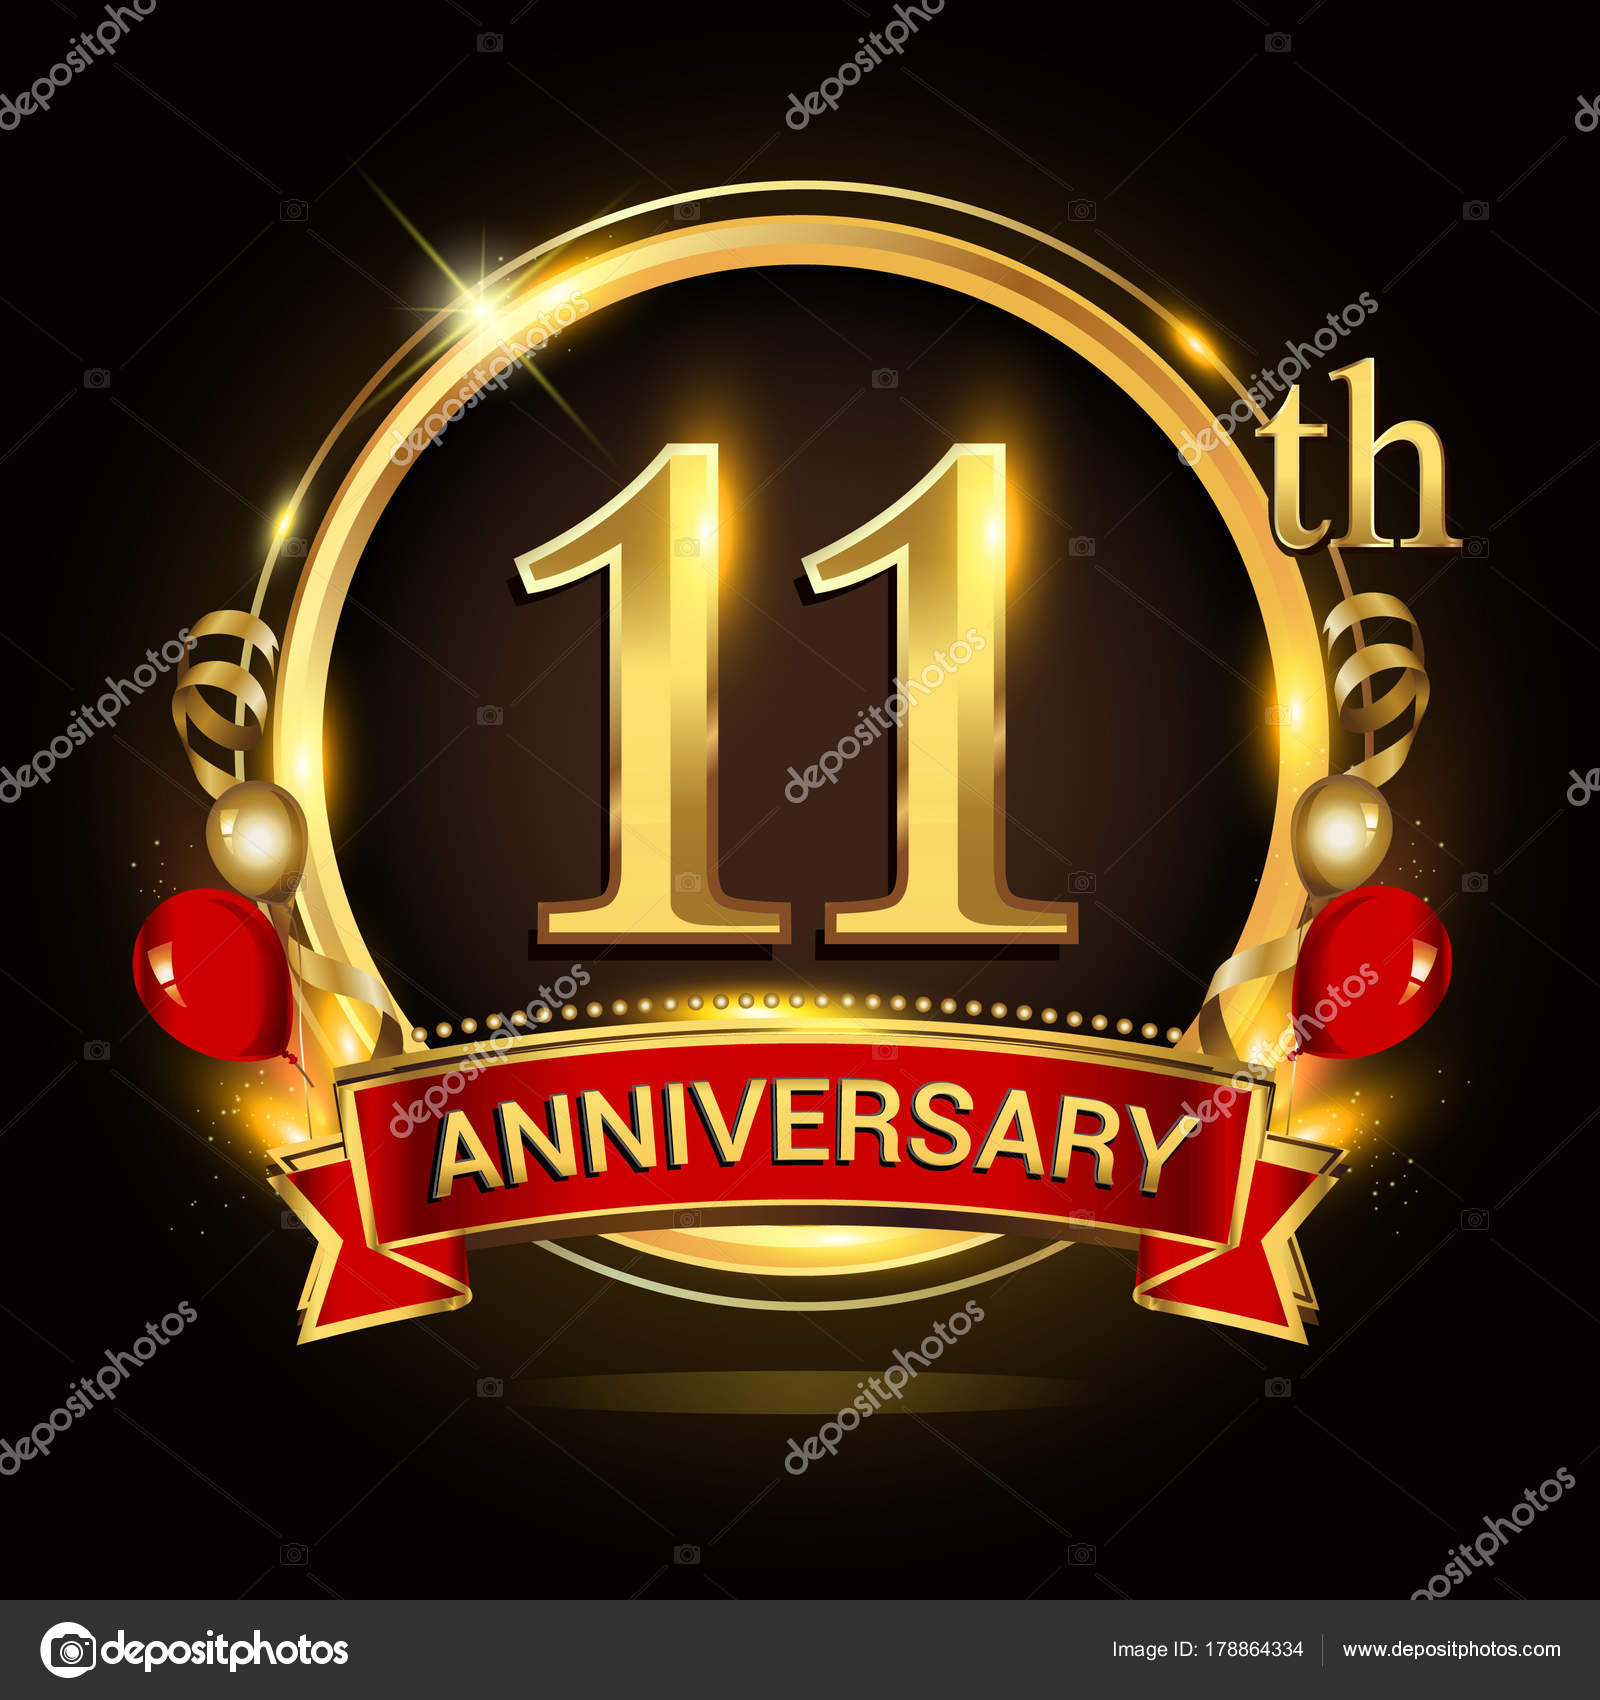 11th anniversary logo golden ring balloons red ribbon vector design